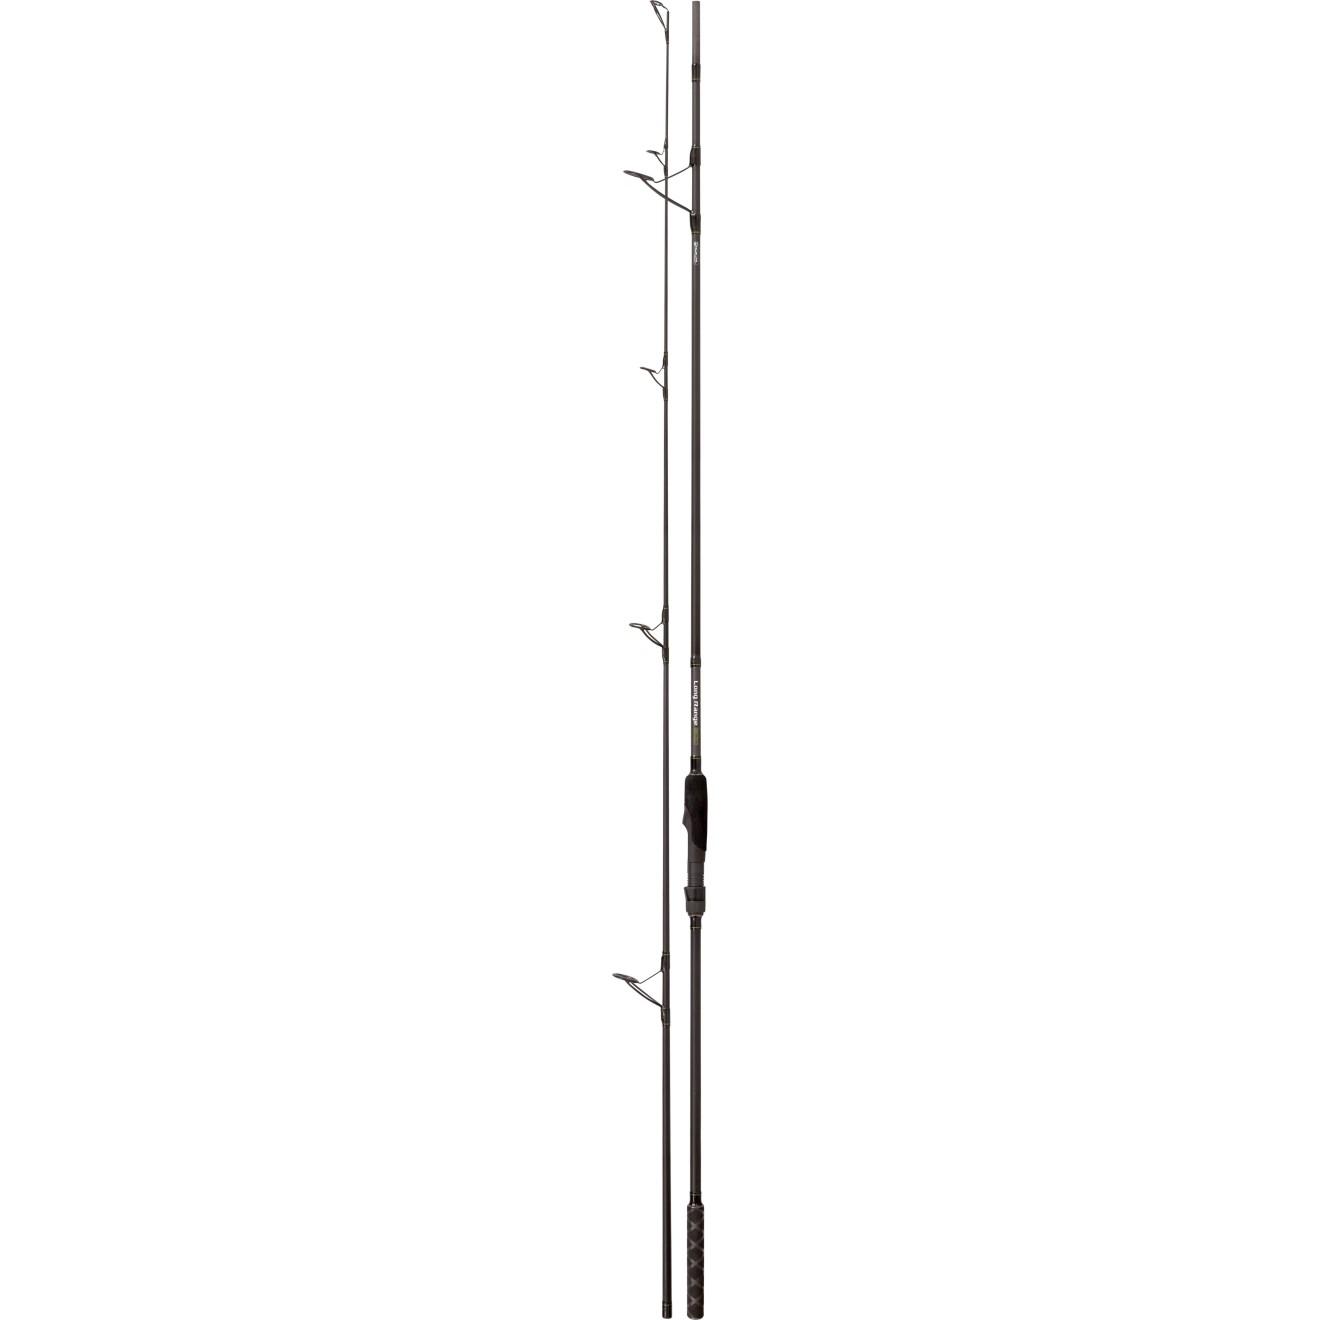 QFWN Bef/örderung!3,6 m 4,5 m Telescopic Spinning Angelrute Kohlenholzgriff Karpfen Angelrute Seefelsen Angelrute Test 30-150g Length : 210cm